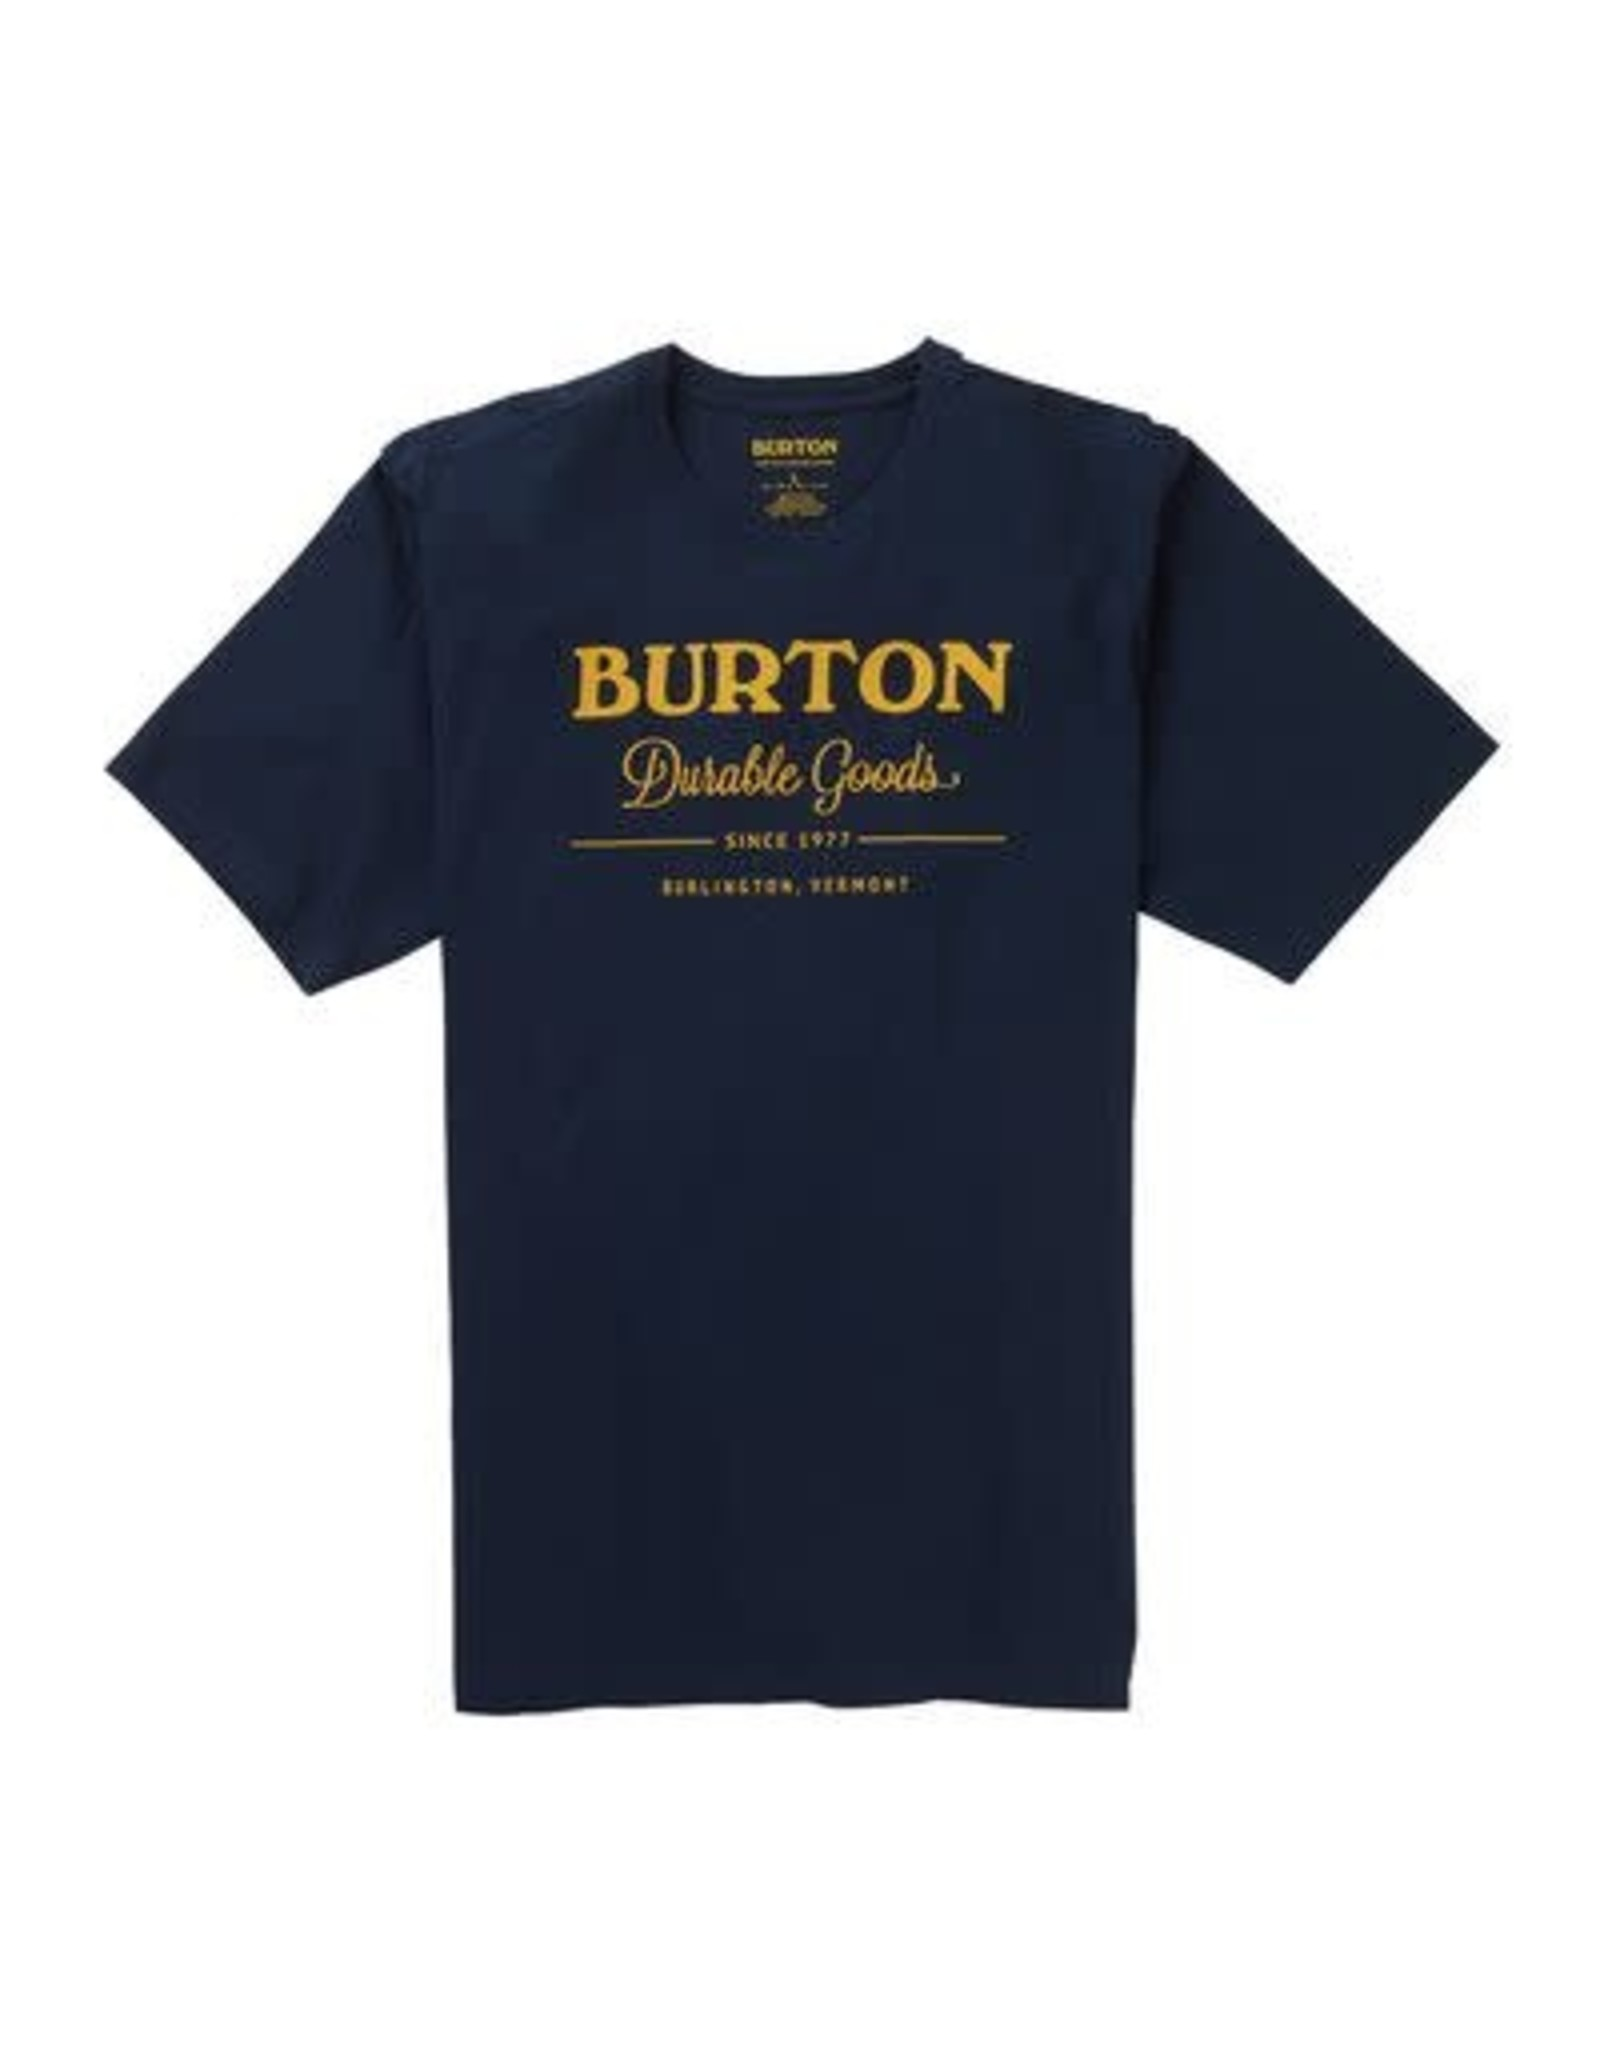 Burton Durable Goods Short Sleeve T-Shirt